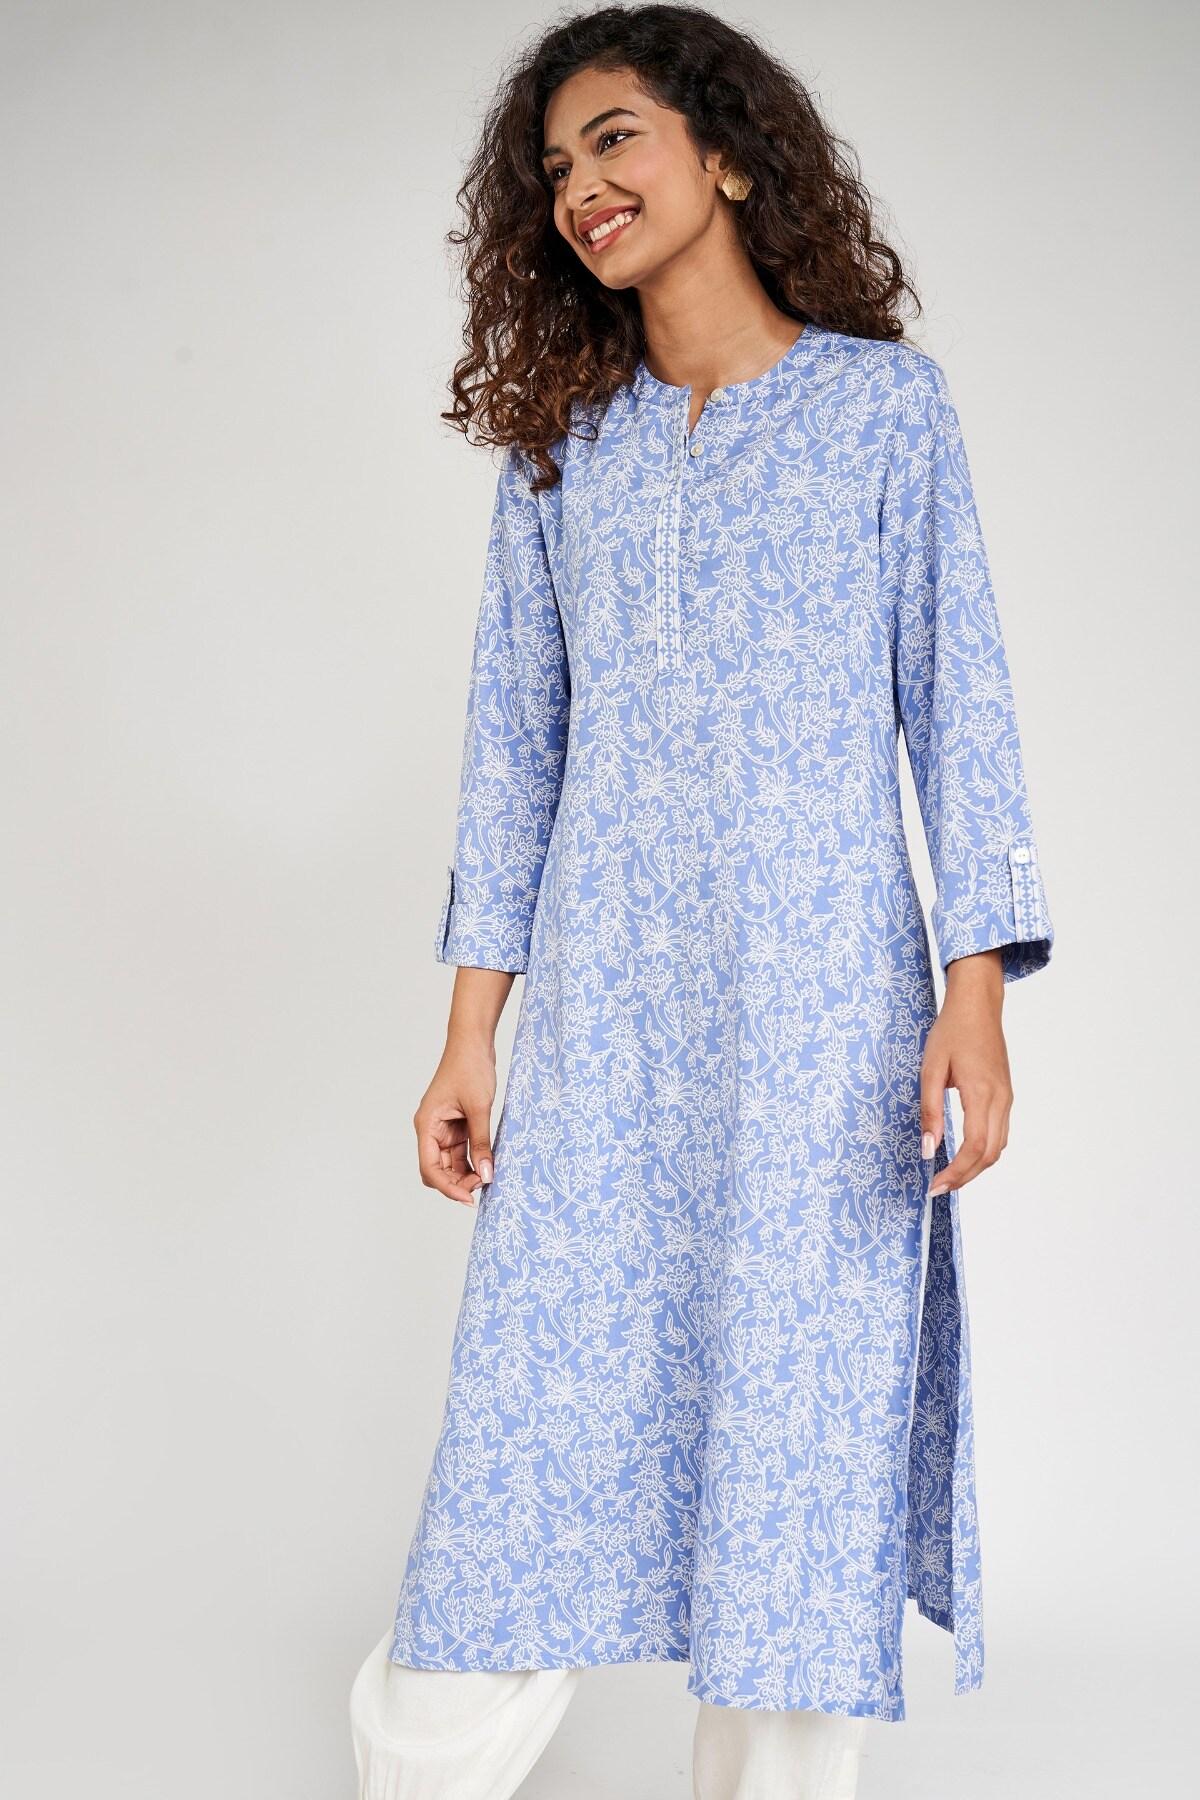 Global Desi | Blue Floral Printed Kurta